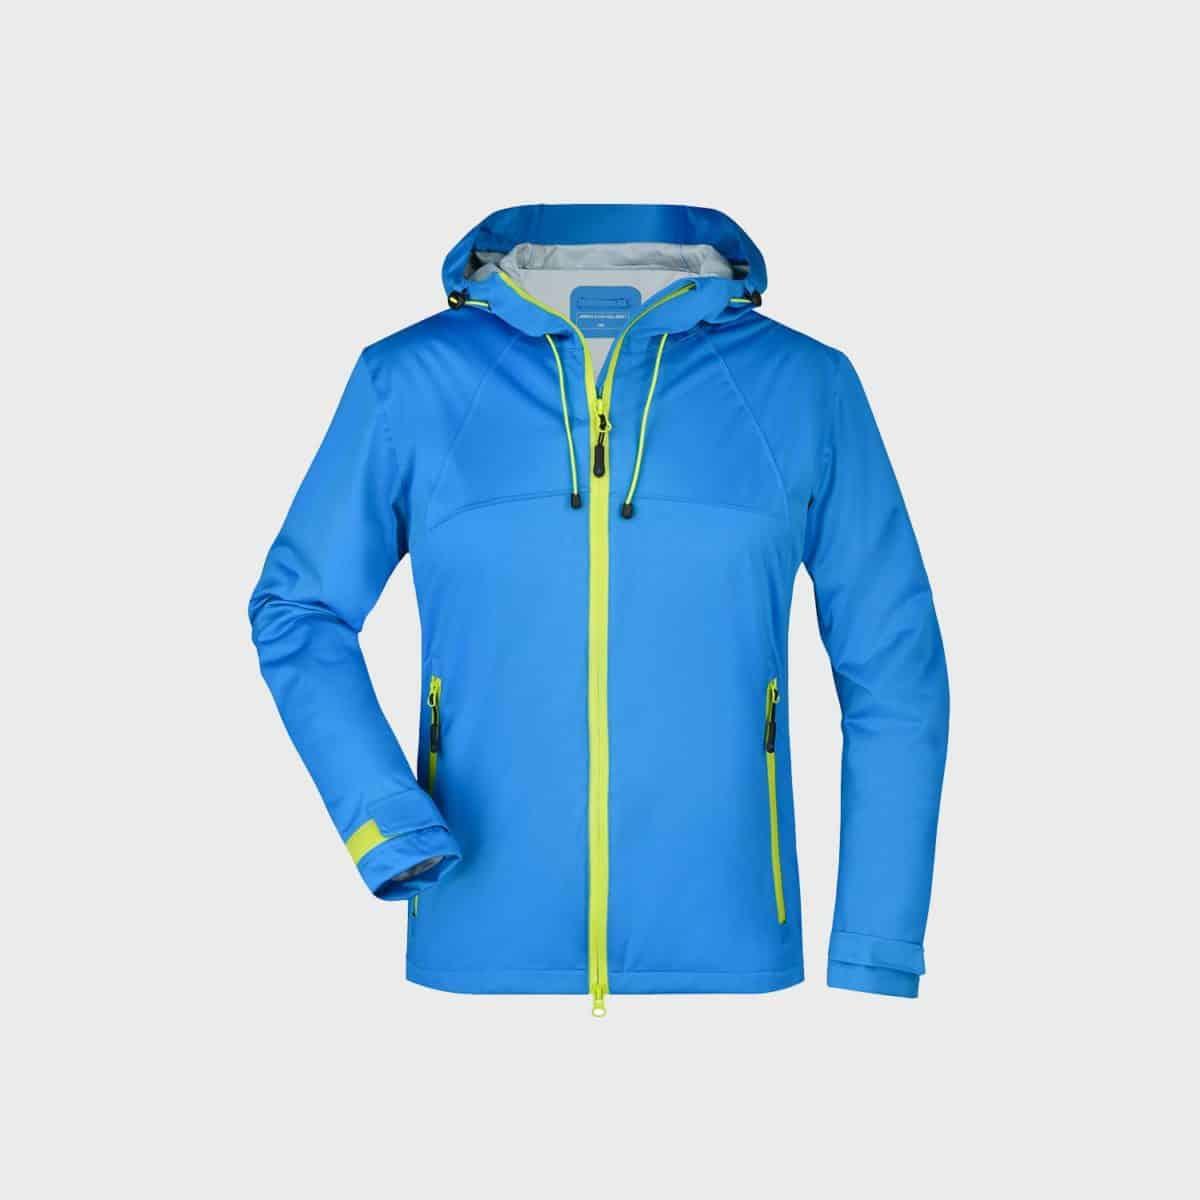 outdoor-jacket-damen-aqua-acid-yellow-kaufen-besticken_stickmanufaktur